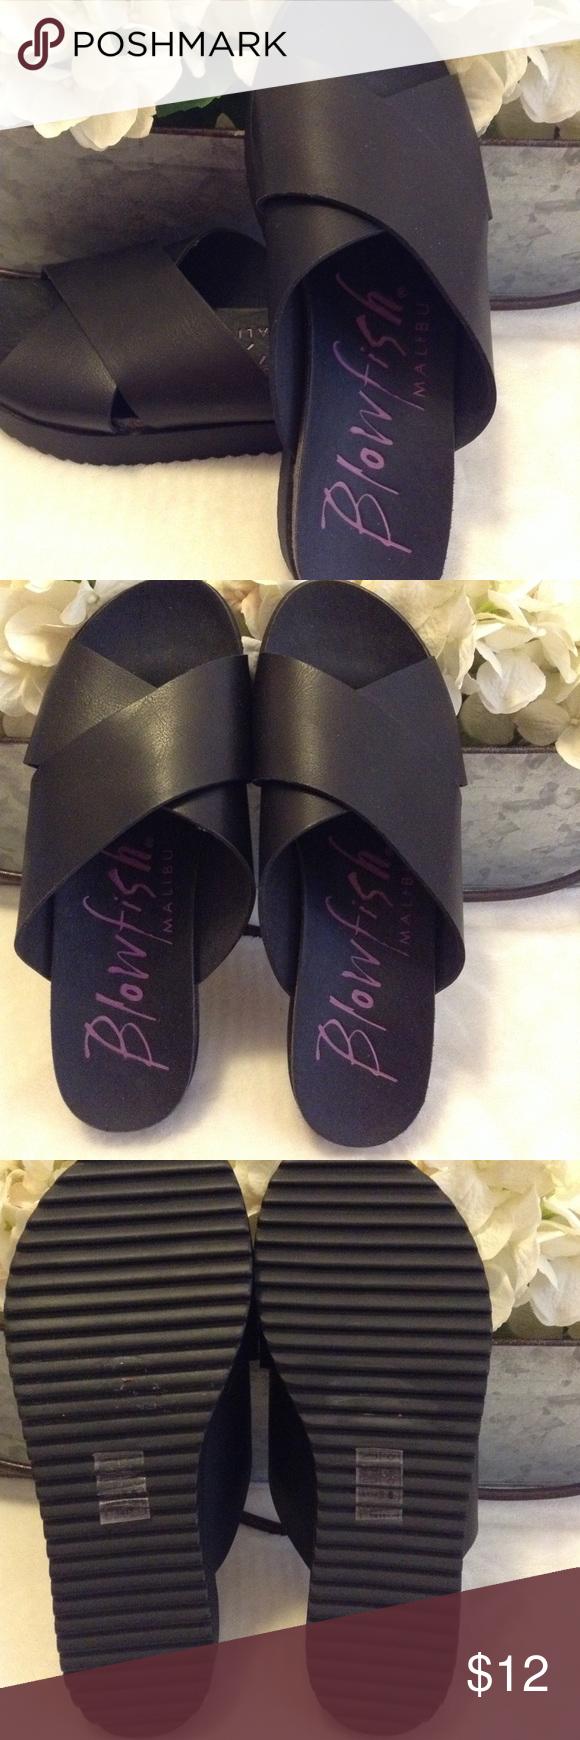 Blowfish Malibu Slide Sandals Women's